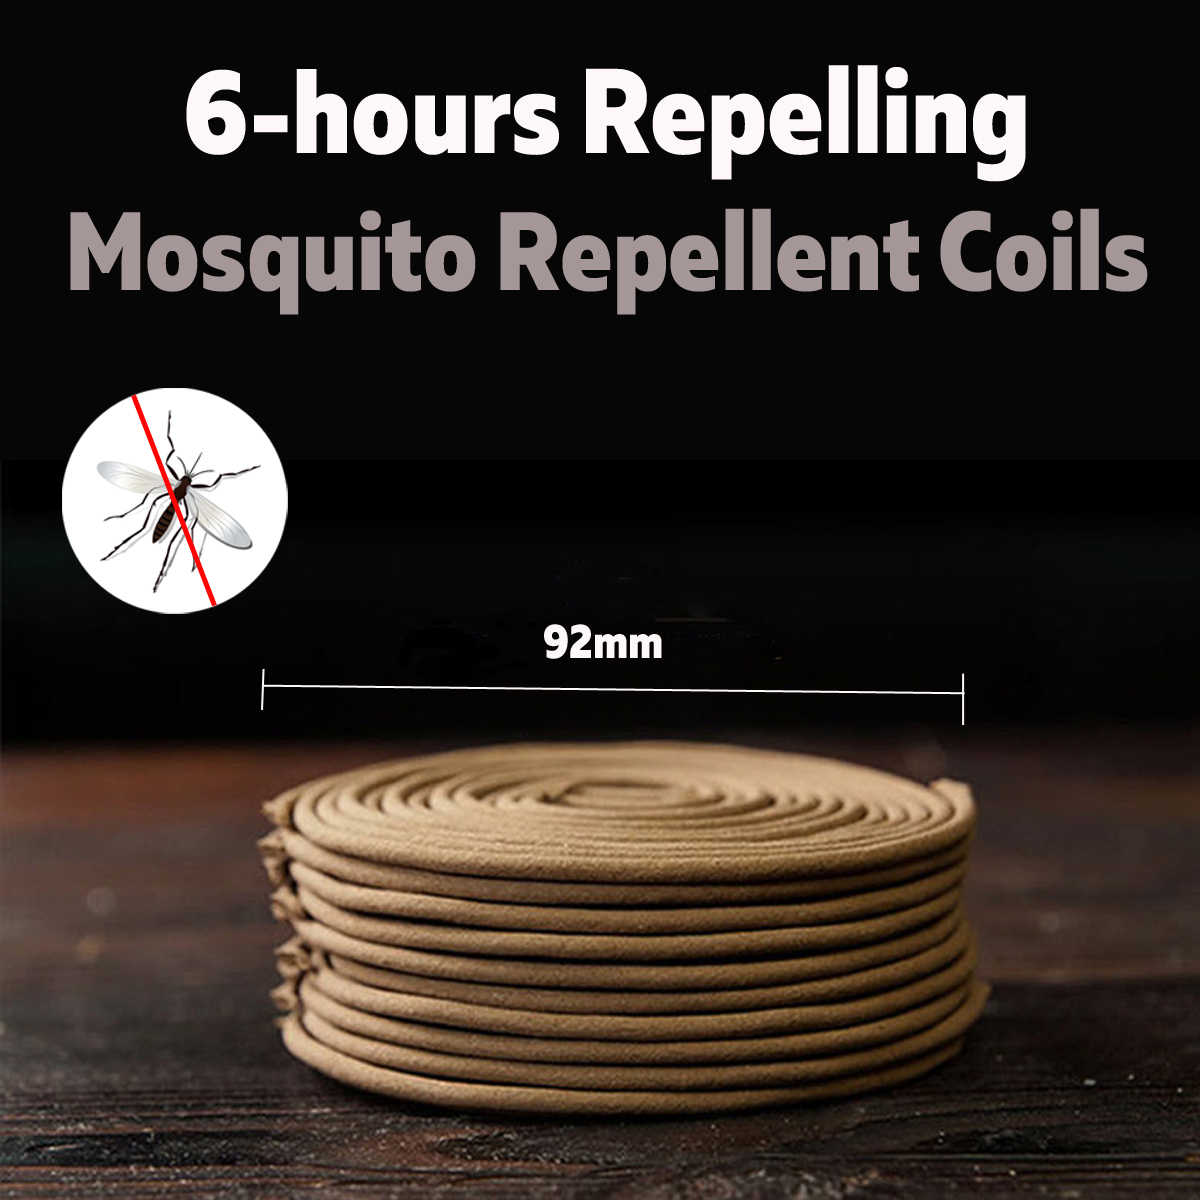 20 Pcs Nyamuk Kumparan Repellents Terbang Serangga Repeller Coils dengan Penahan 92 Mm Rumah Bedroom Taman Pengendalian Hama Aksesoris